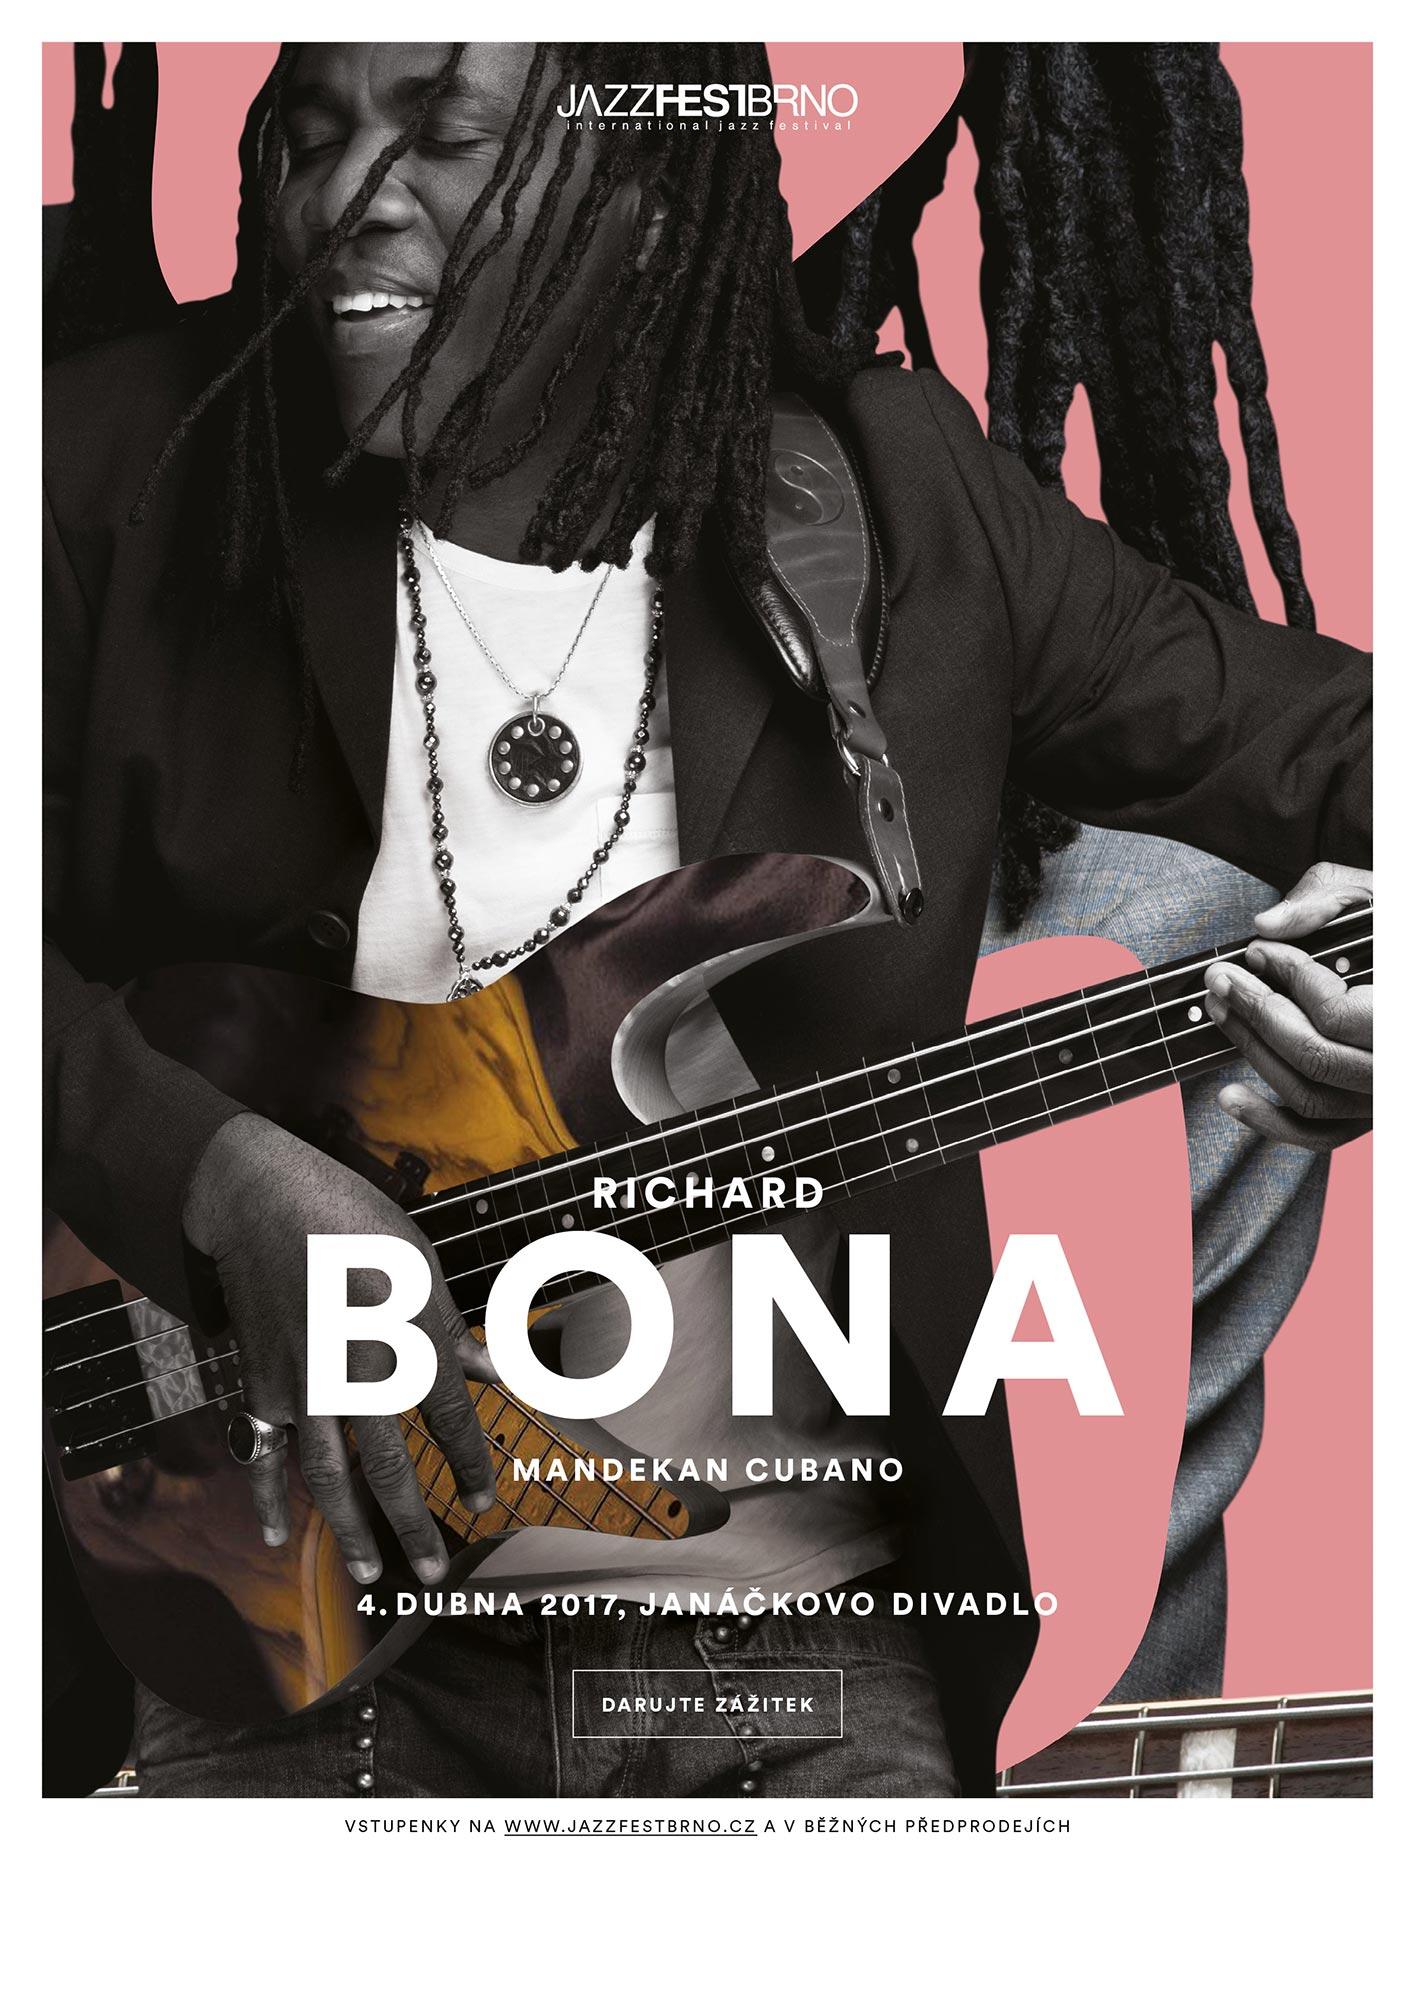 Jazzfestbrno 2017 - Richard Bona Mandecan Cubano